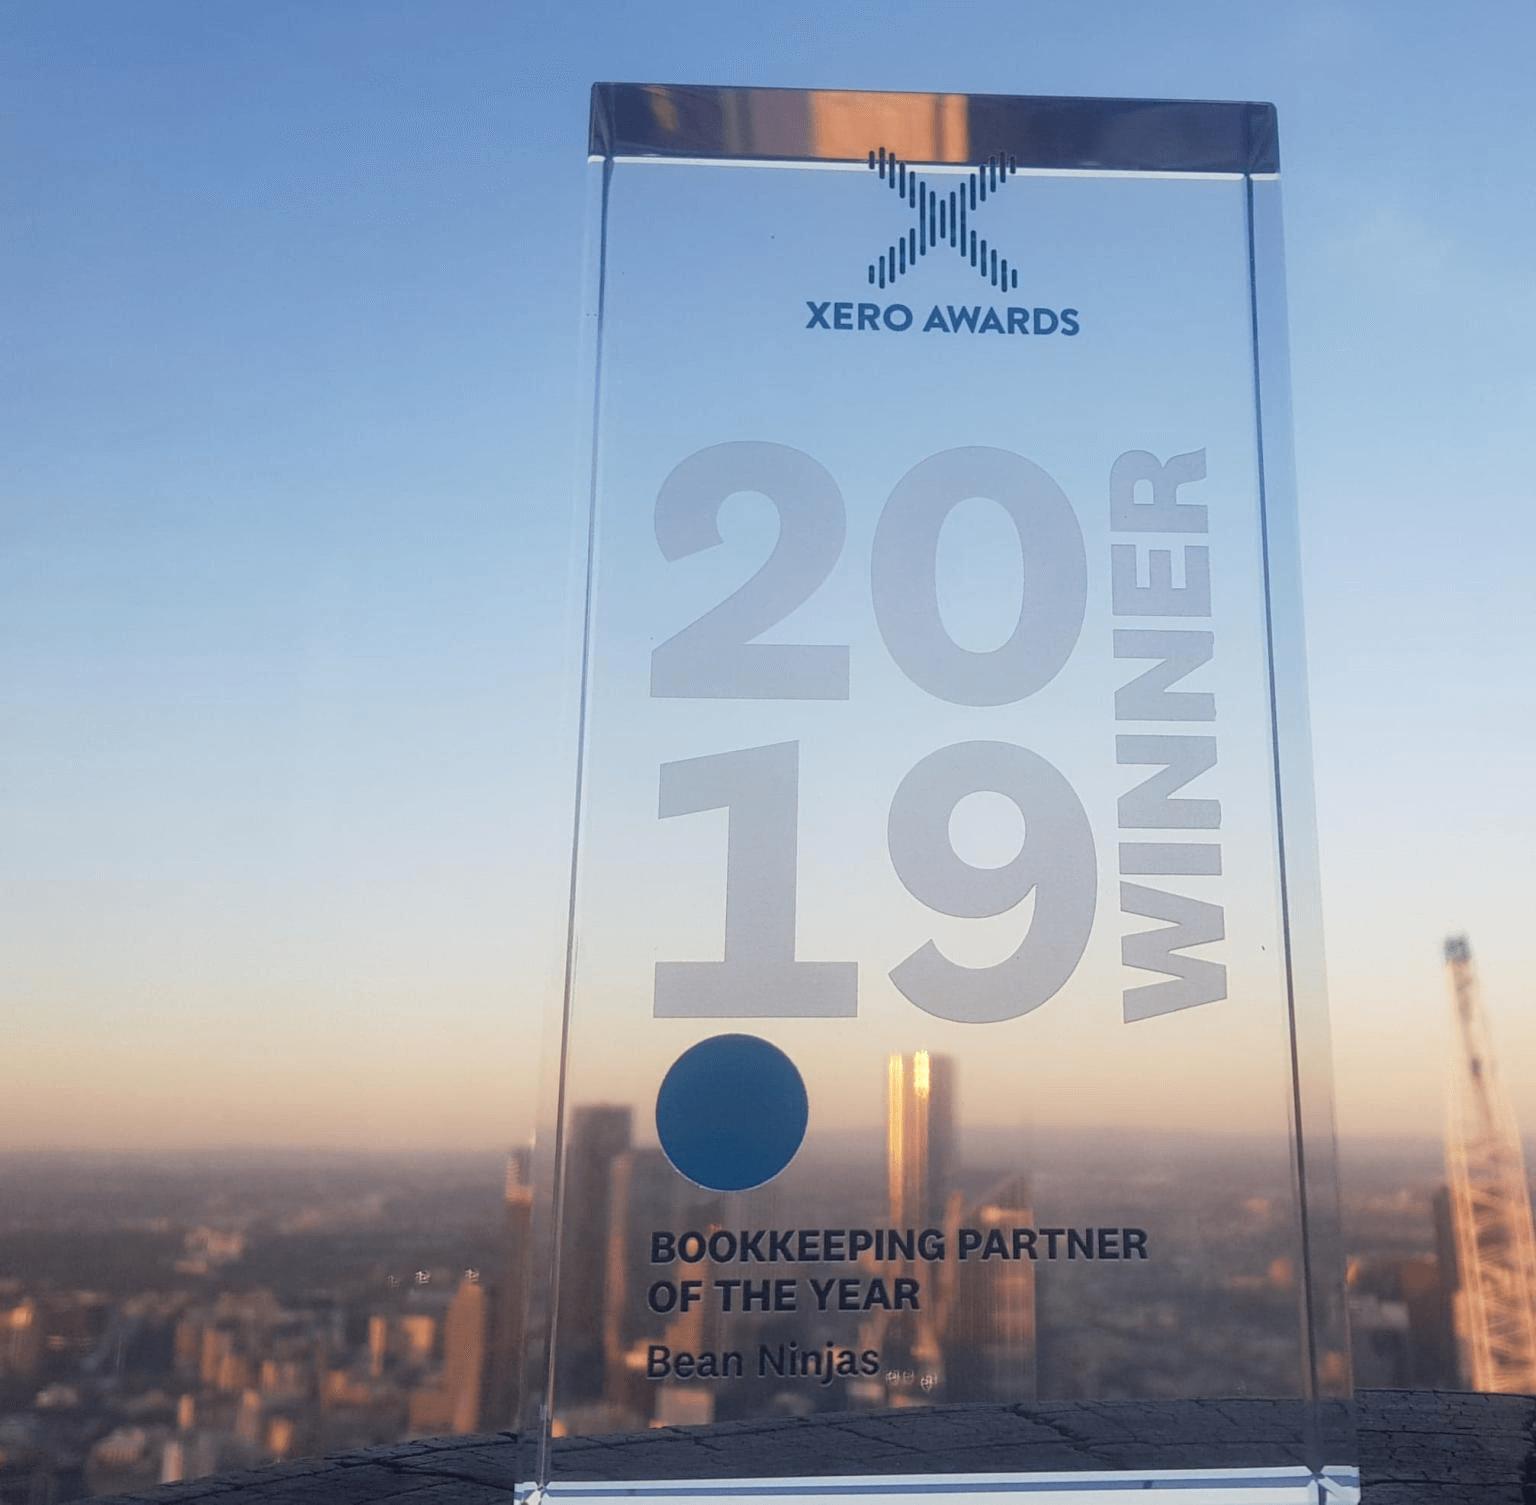 BN Xero Awards 2019